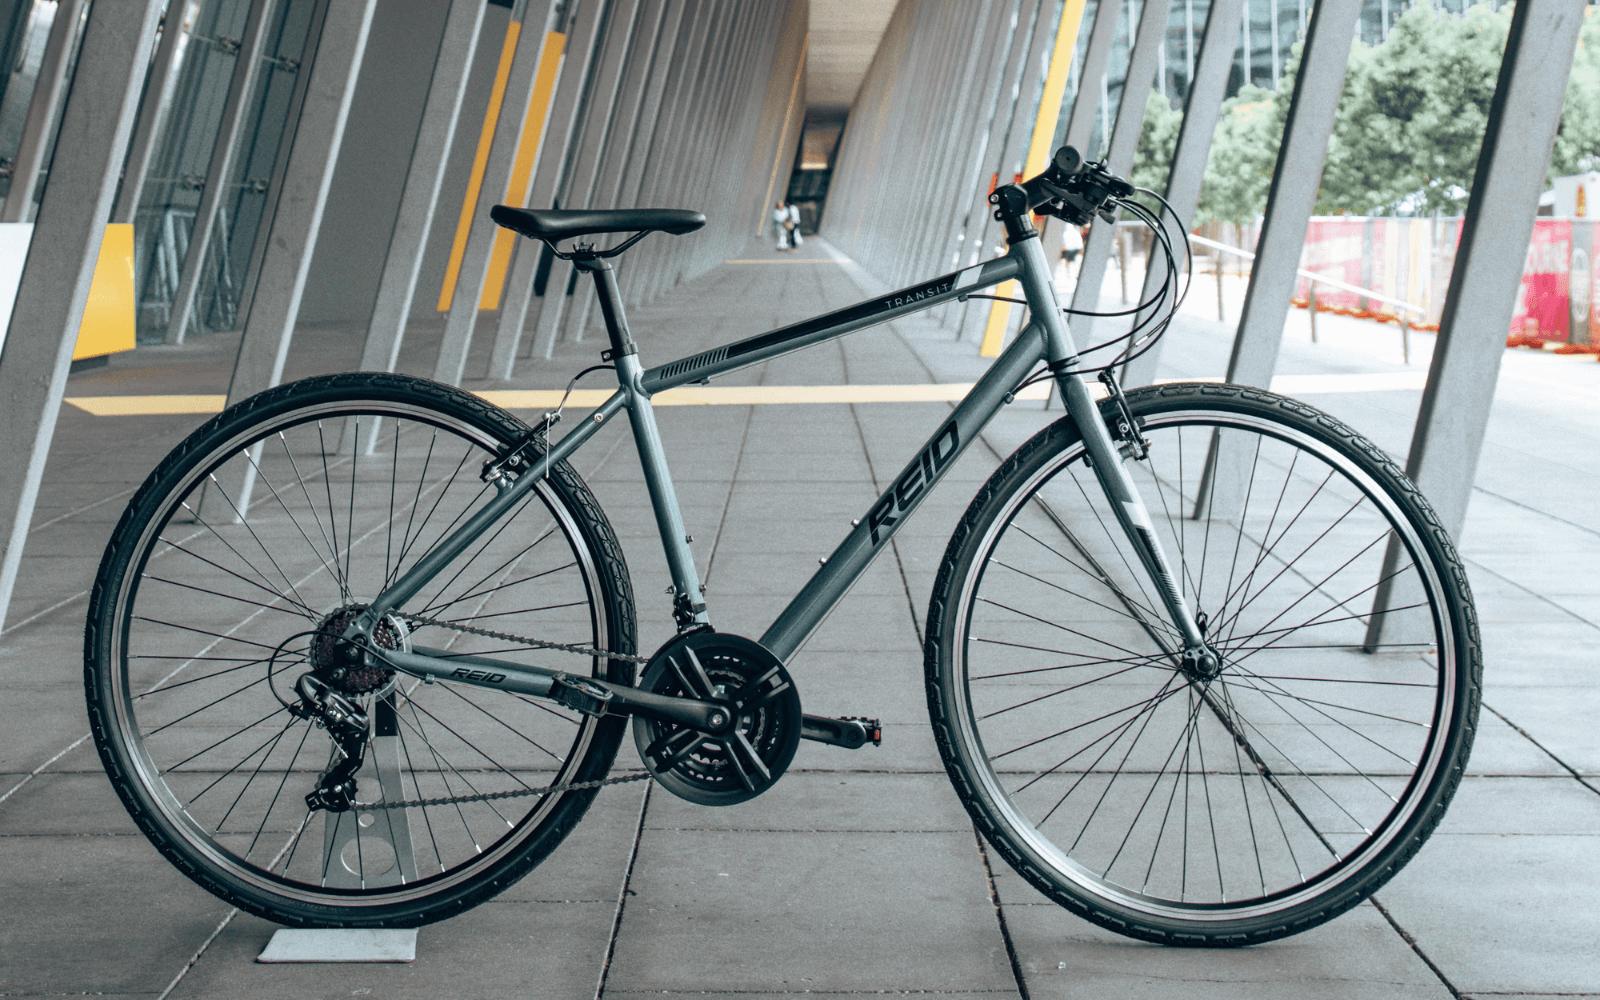 Copy of Copy of Lifestyle images 24 1 - Reid ® - Transit Bike